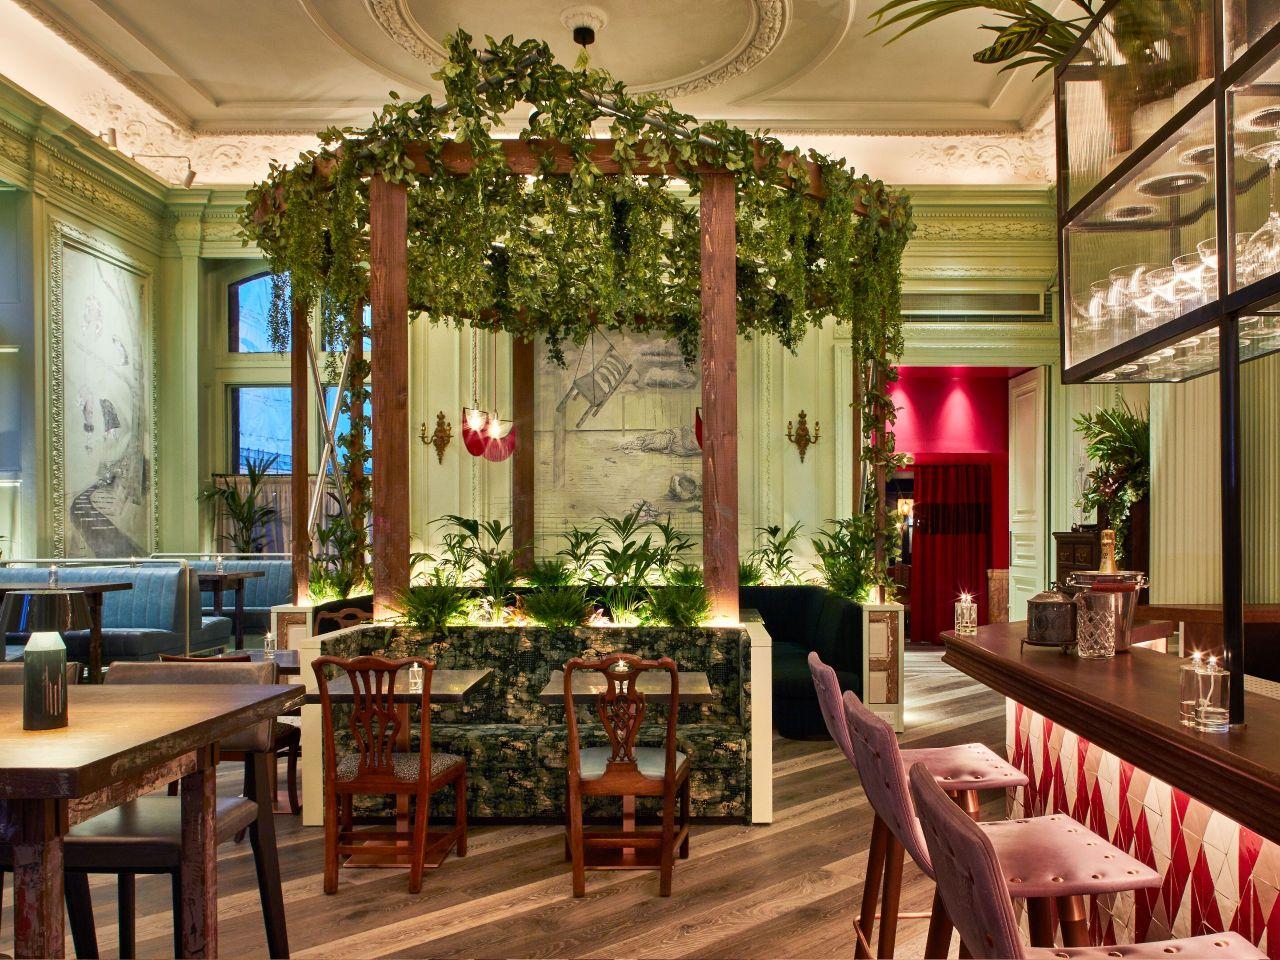 Andaz-London-Liverpool-Street-P897-Dining-Rakes-The-Front-Room.adapt.4x3.1280.960.jpg